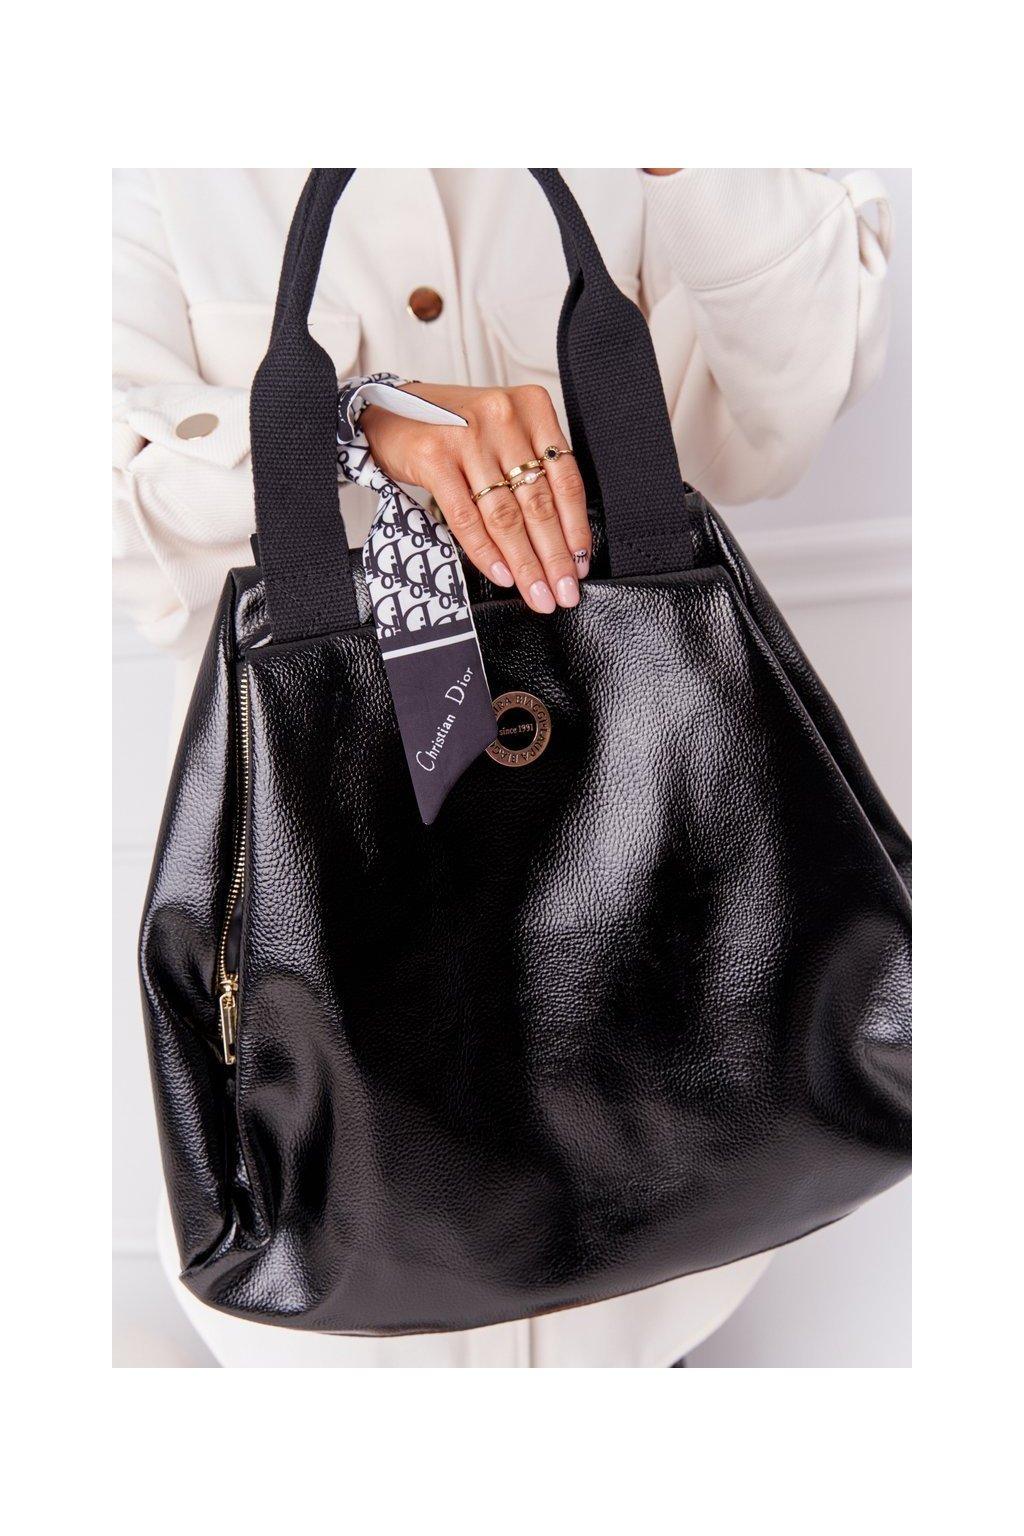 Dámska kabelka čierna kód kabelky G884 BLACK